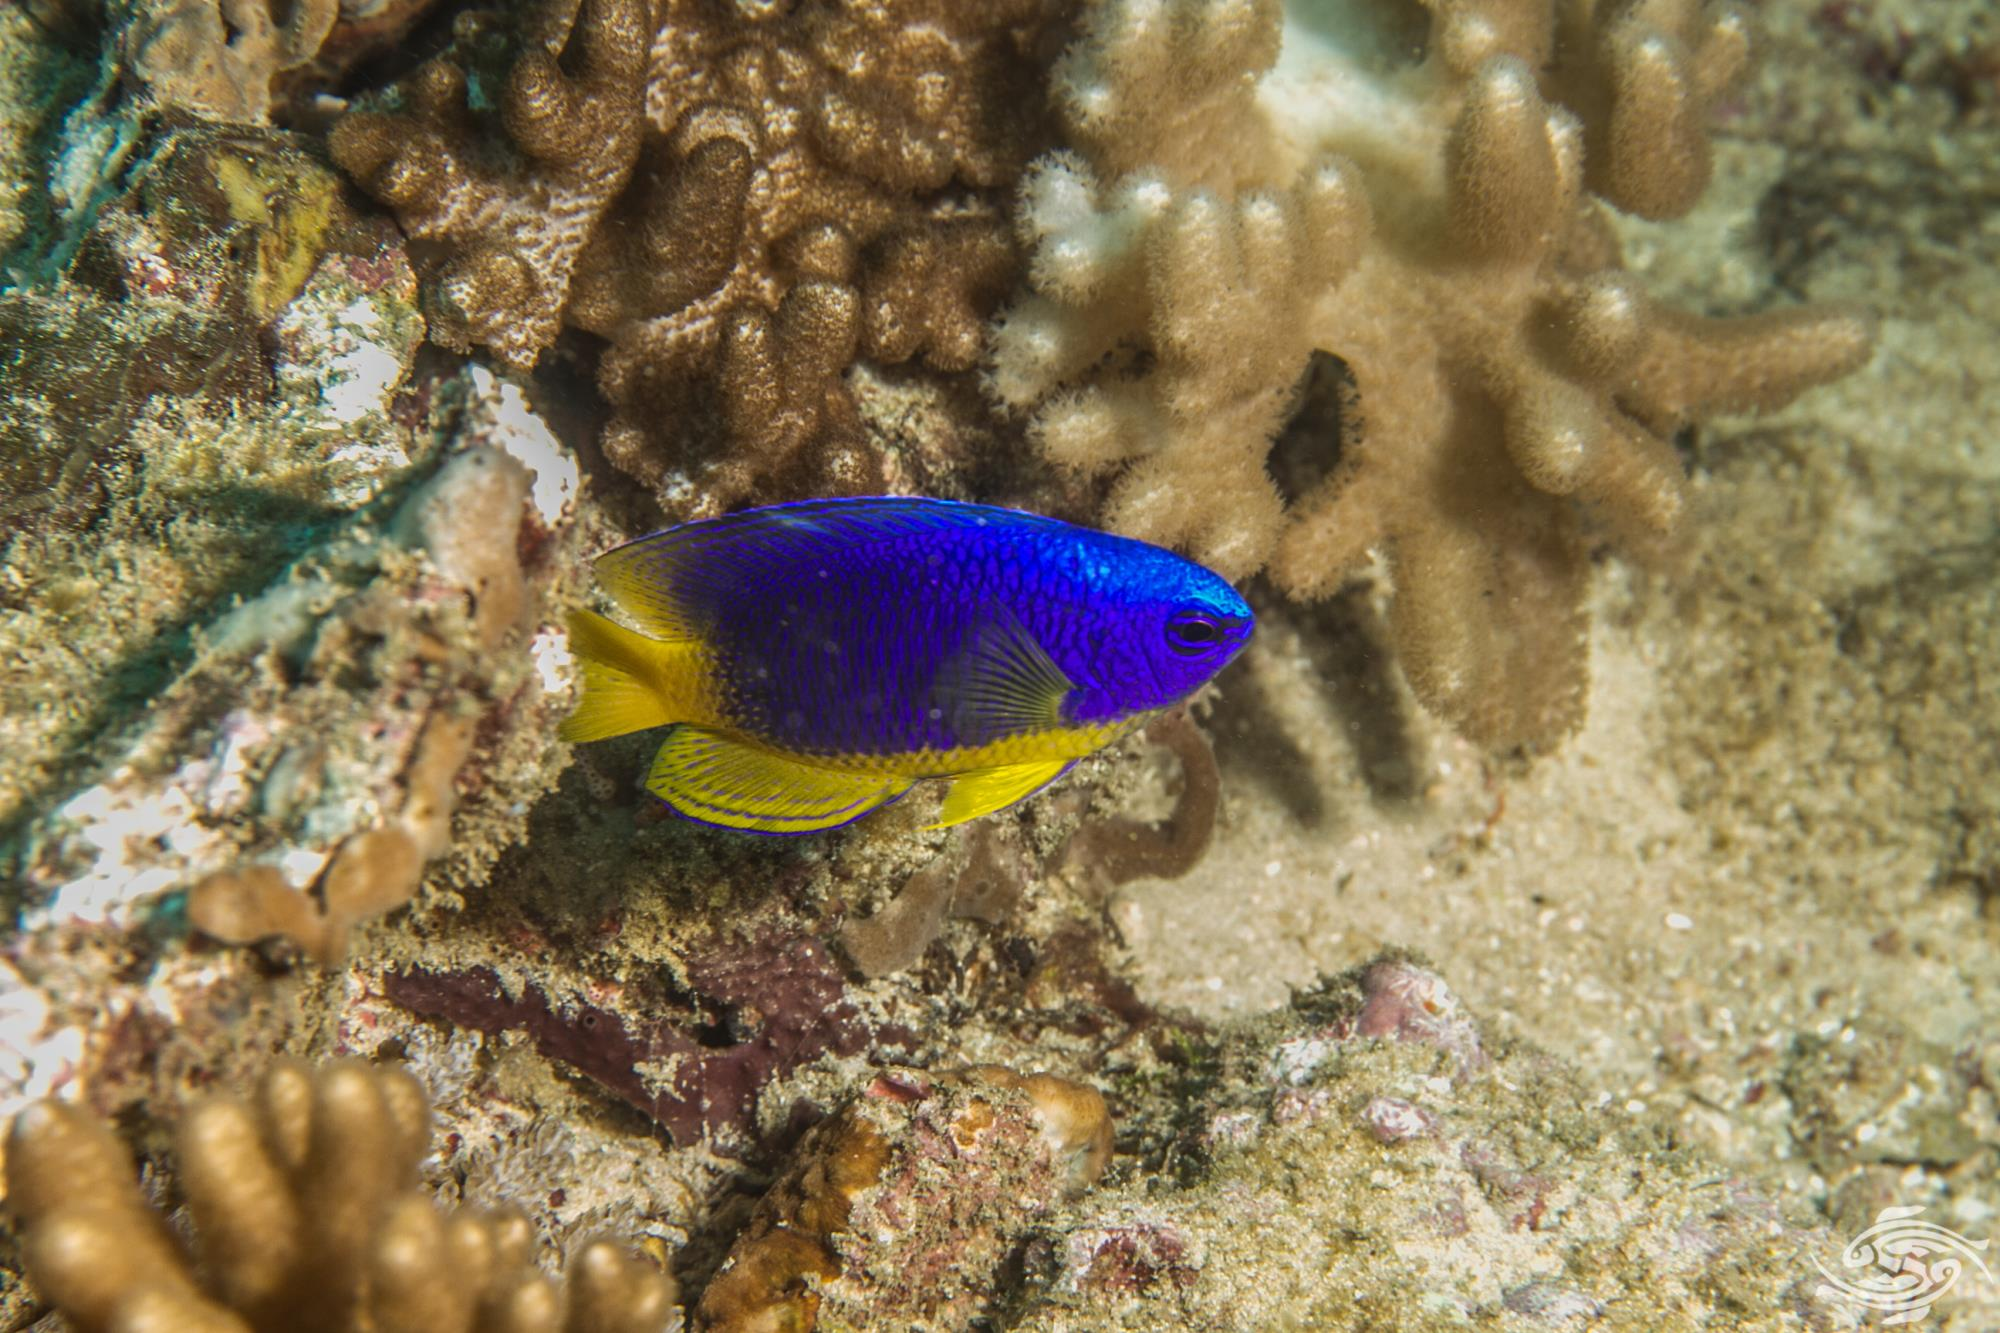 Caerulean damsel fish (Pomacentrus caeruleus) is also known as the Regal damselfish, the Yellow Belly damselfish and Golden Belly Damselfish